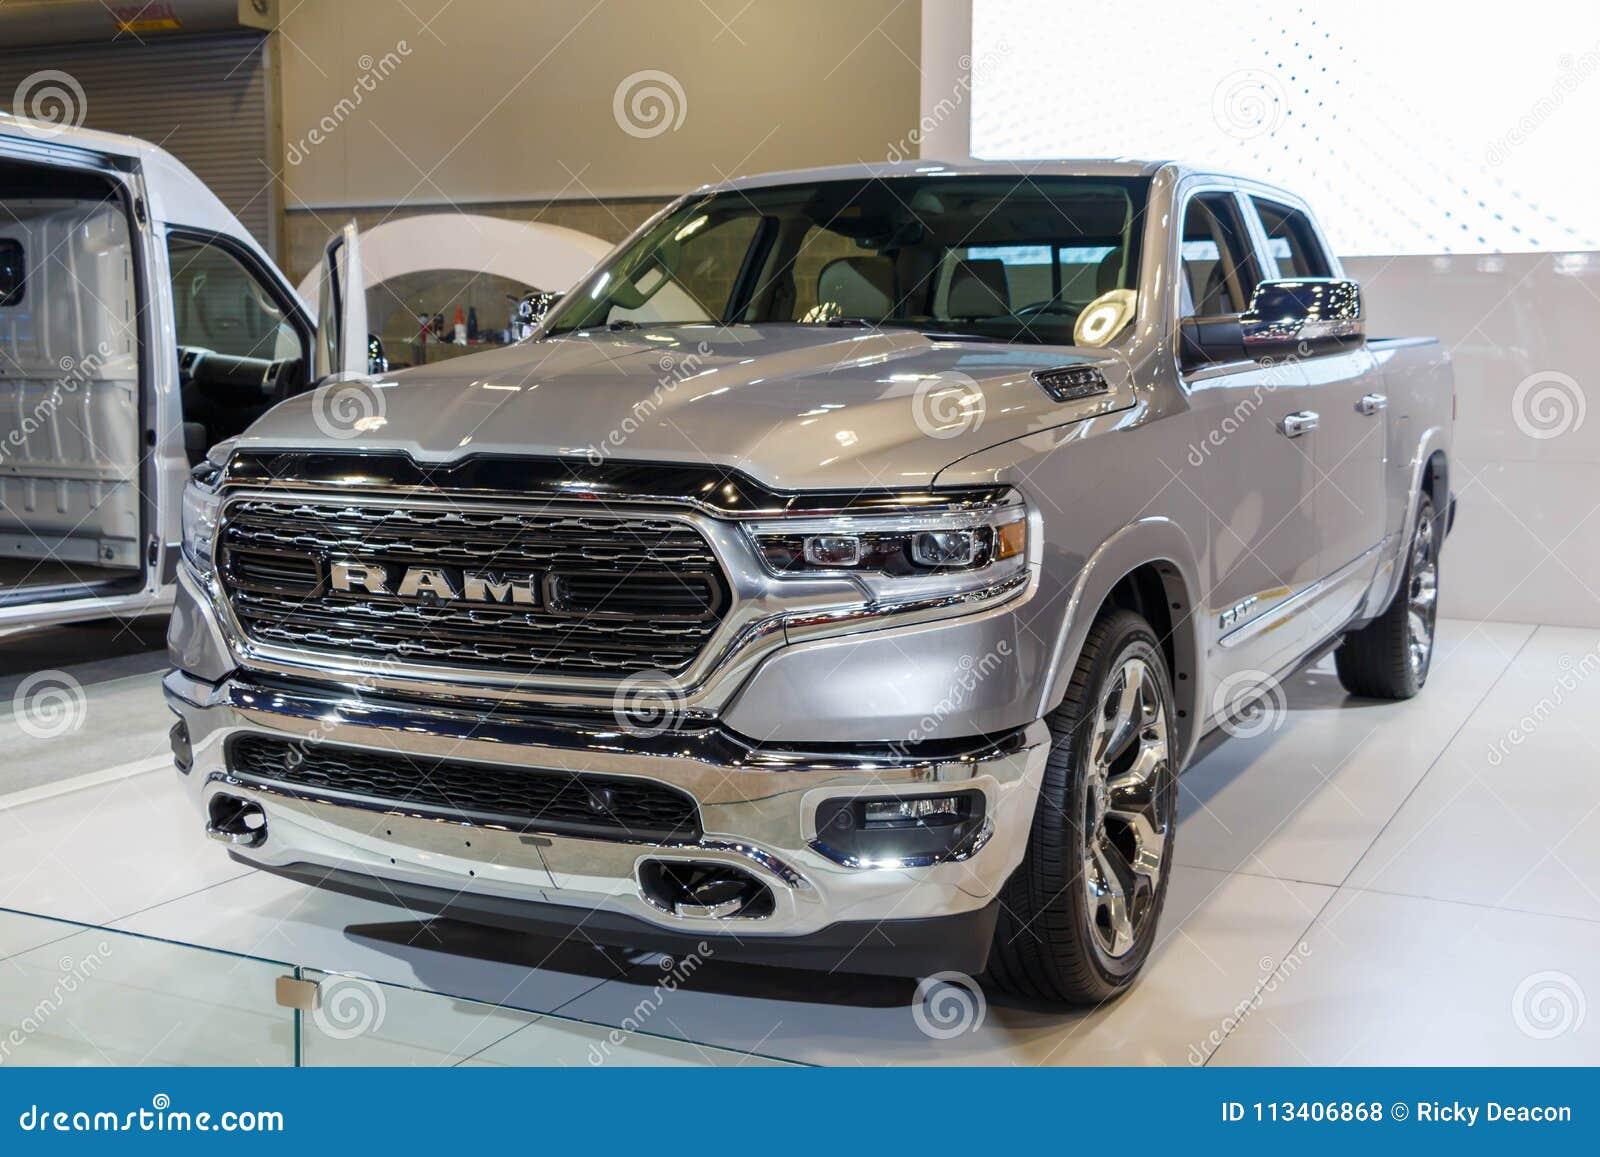 ram edition a longhorn centre hemi cars bakkies city dodge